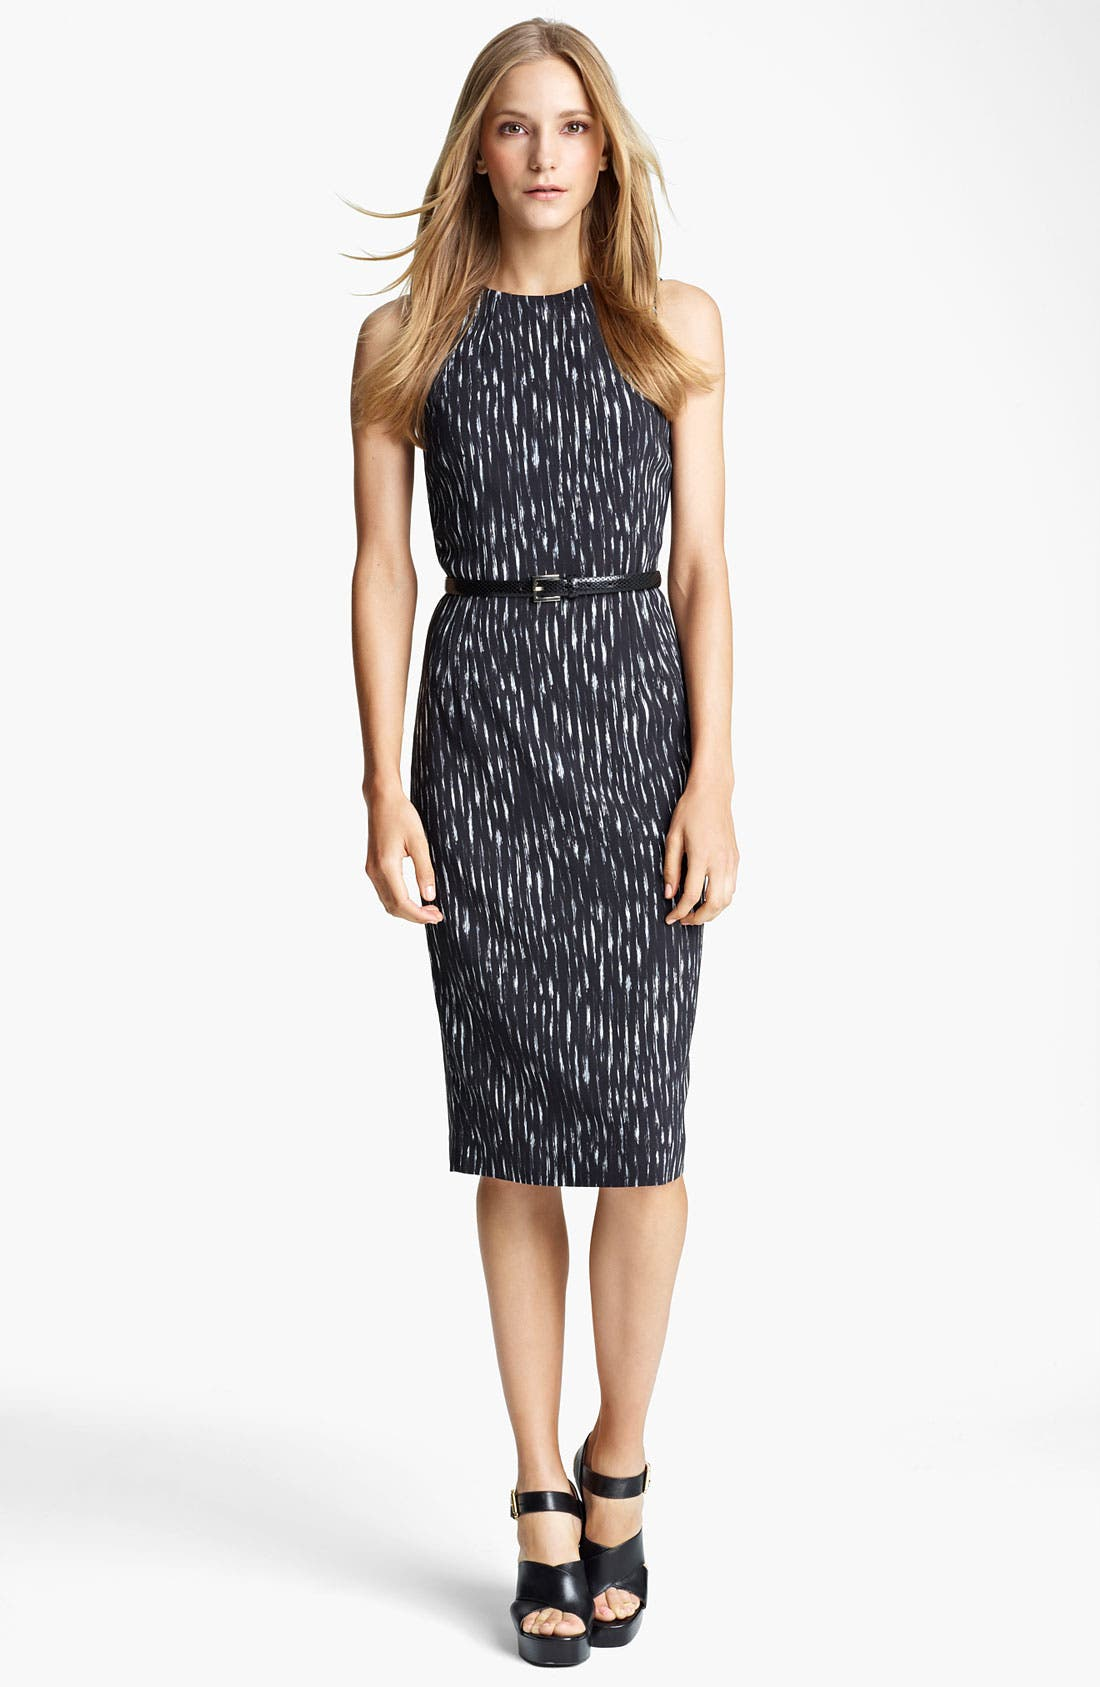 Main Image - Michael Kors Ikat Print Cady Sheath Dress